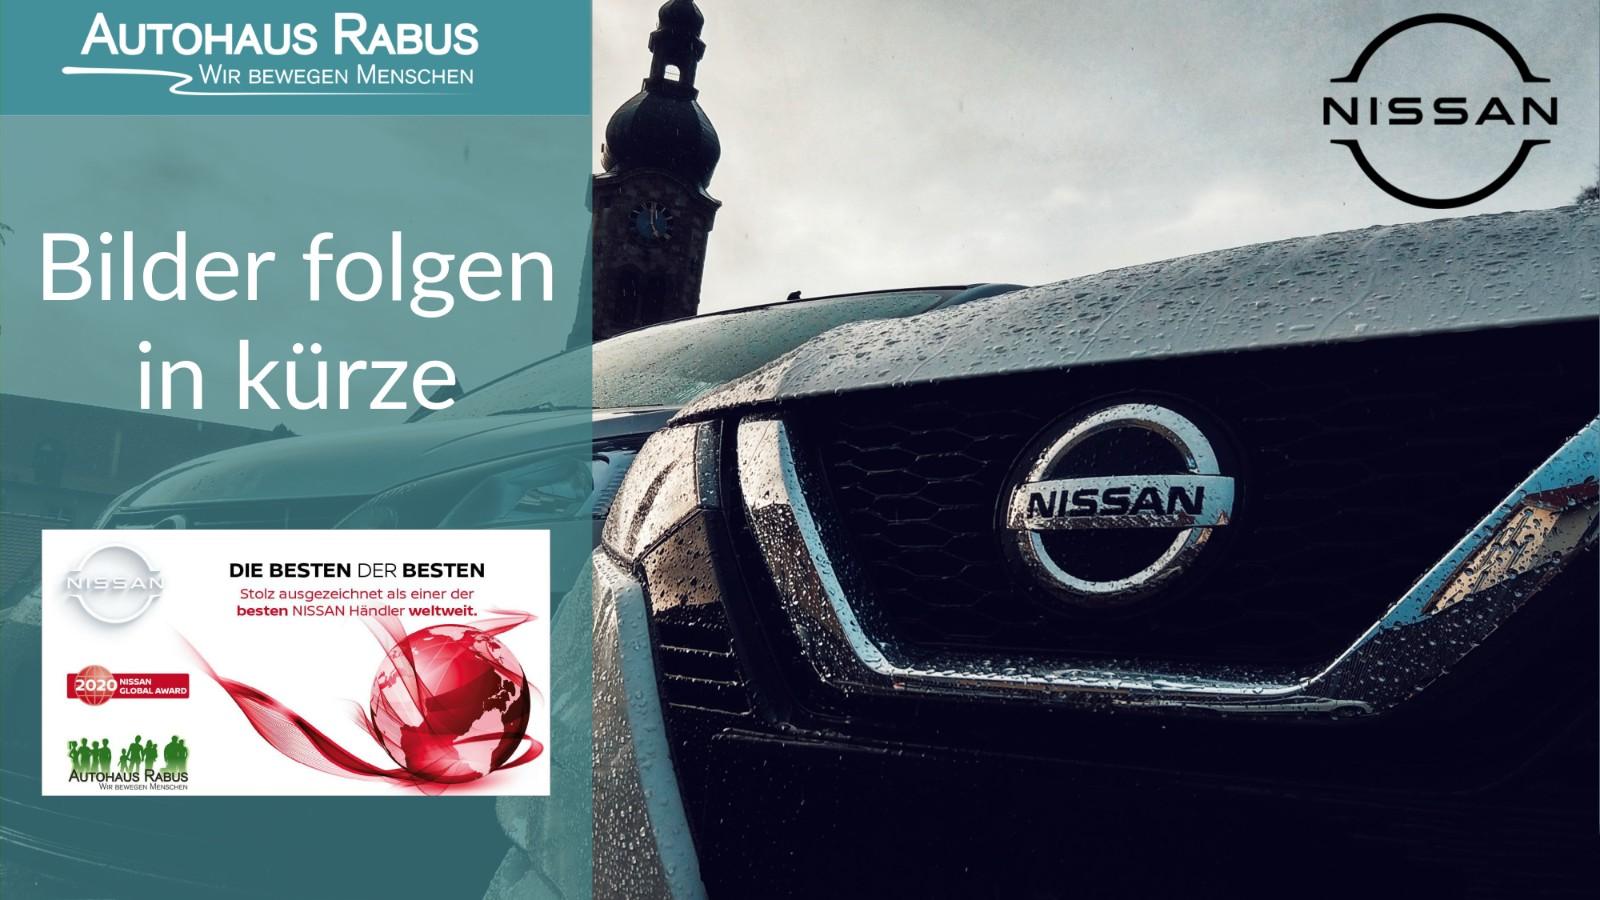 Nissan NV200 Evalia 1.5 Klima, 7 Sitzer, Navi, SH,Tekna, Jahr 2016, Diesel